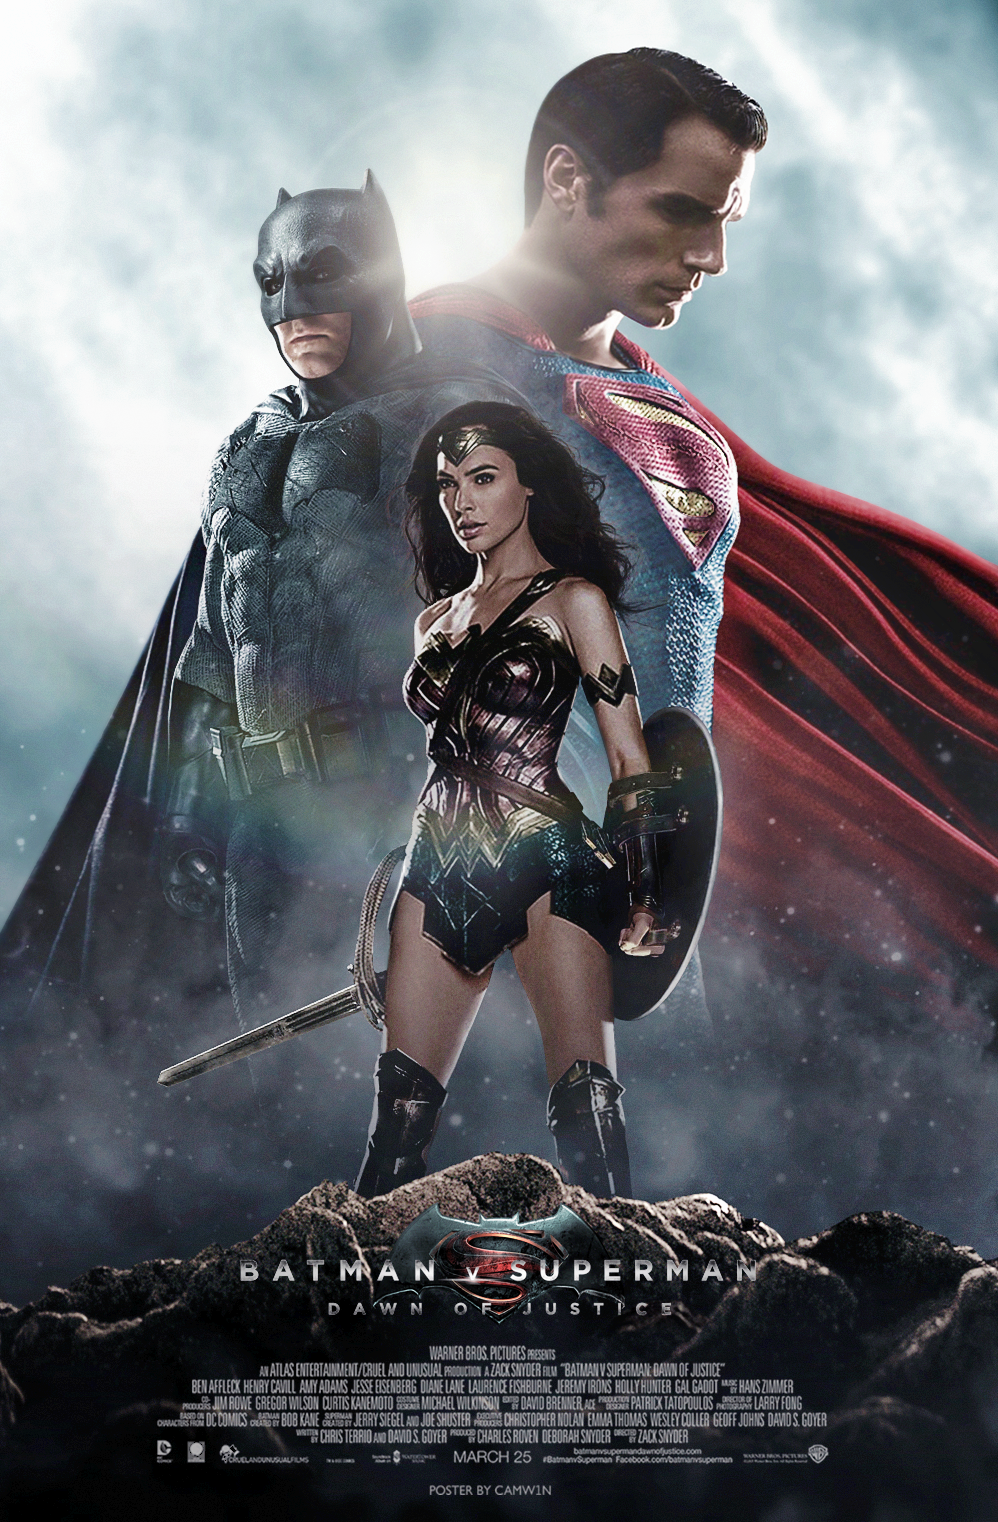 batman_v_superman_poster_by_camw1n-d9qol9d.png